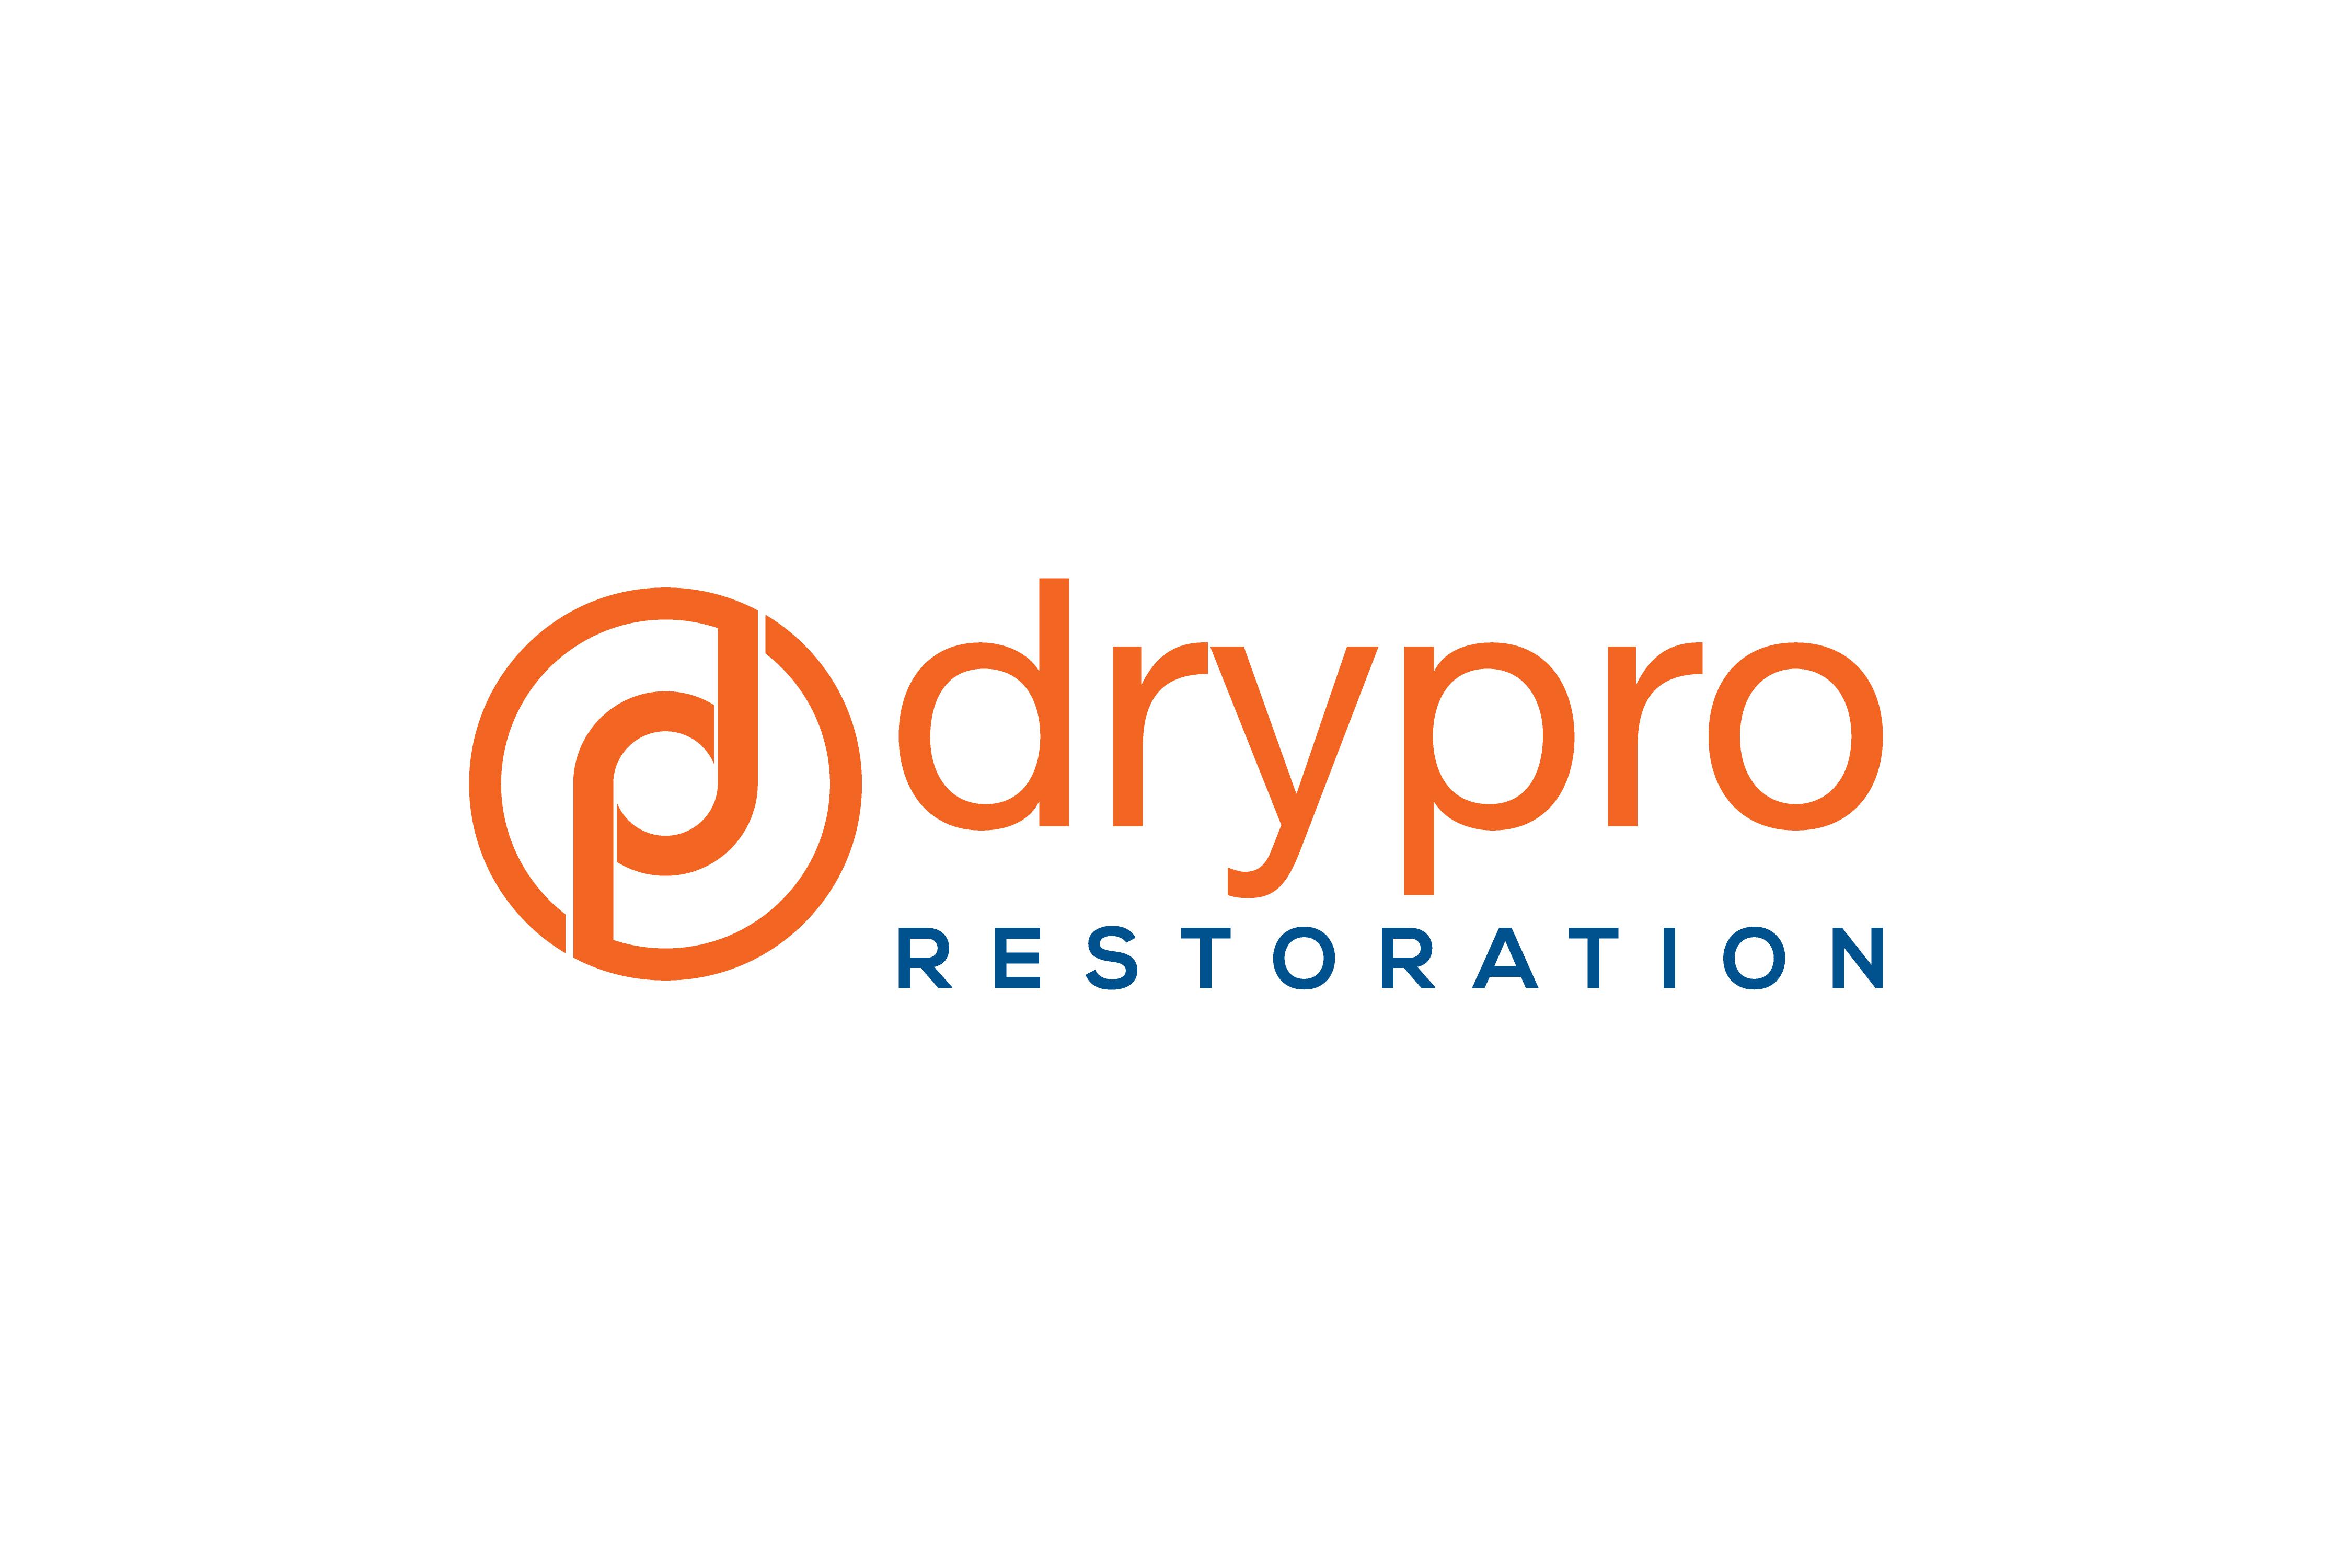 DryPro